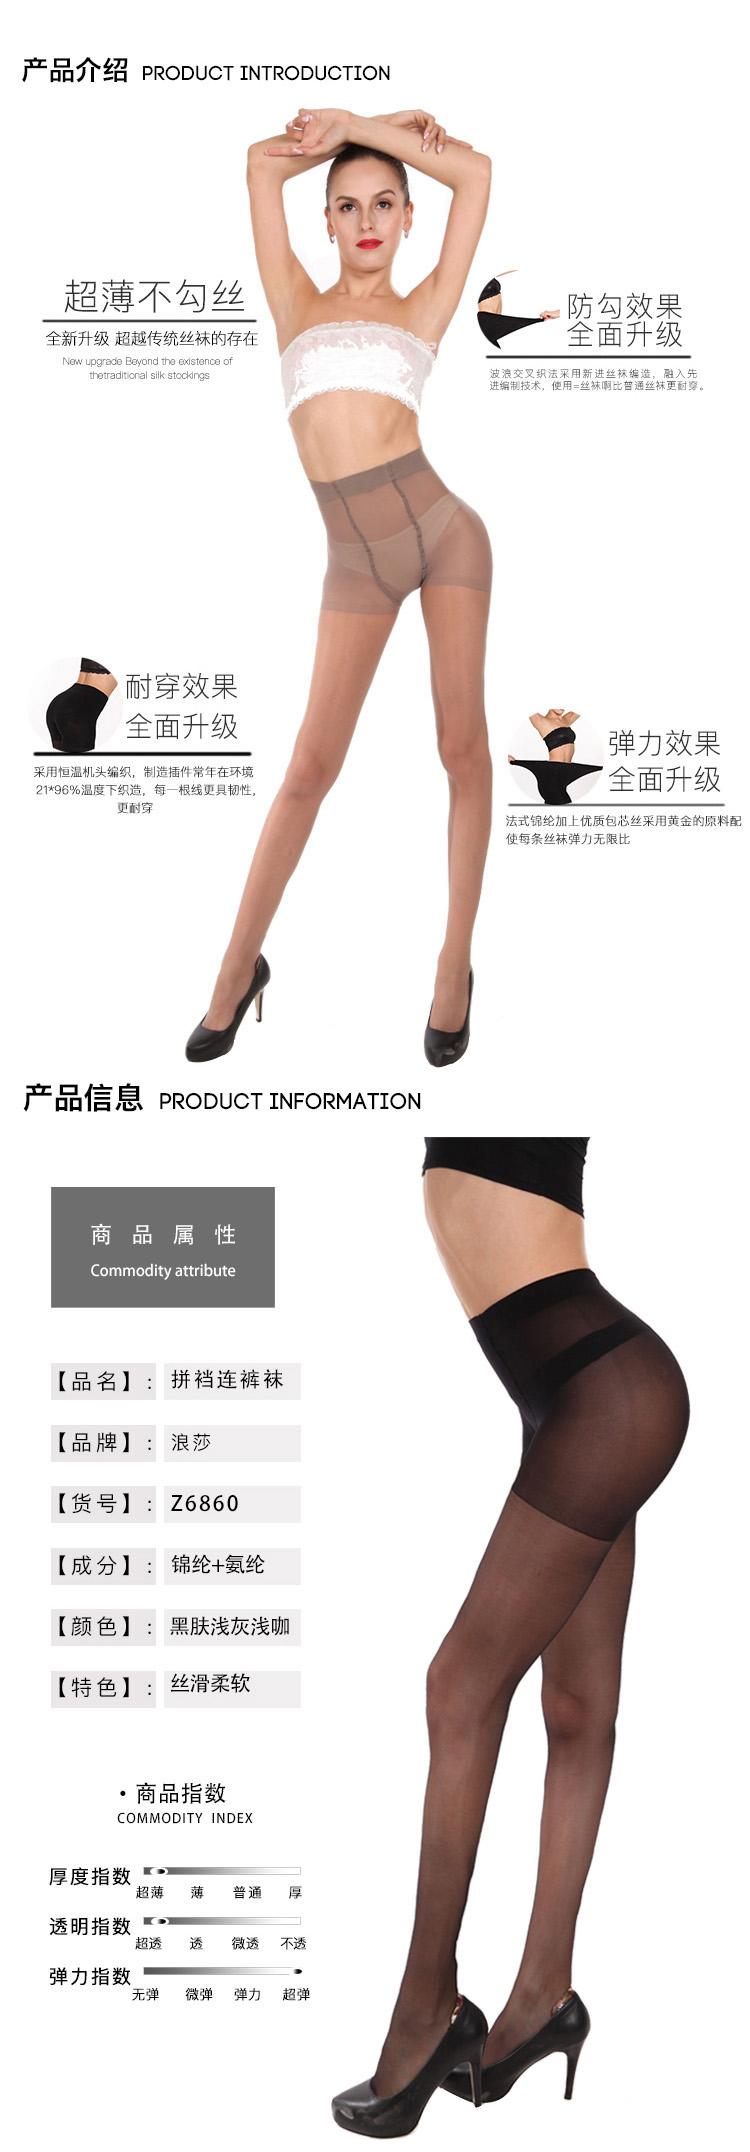 Z6860浪莎2条装拼裆连裤袜夏季防勾丝超薄款丝袜连裤袜隐形性感显瘦黑肉色女士长筒袜图片